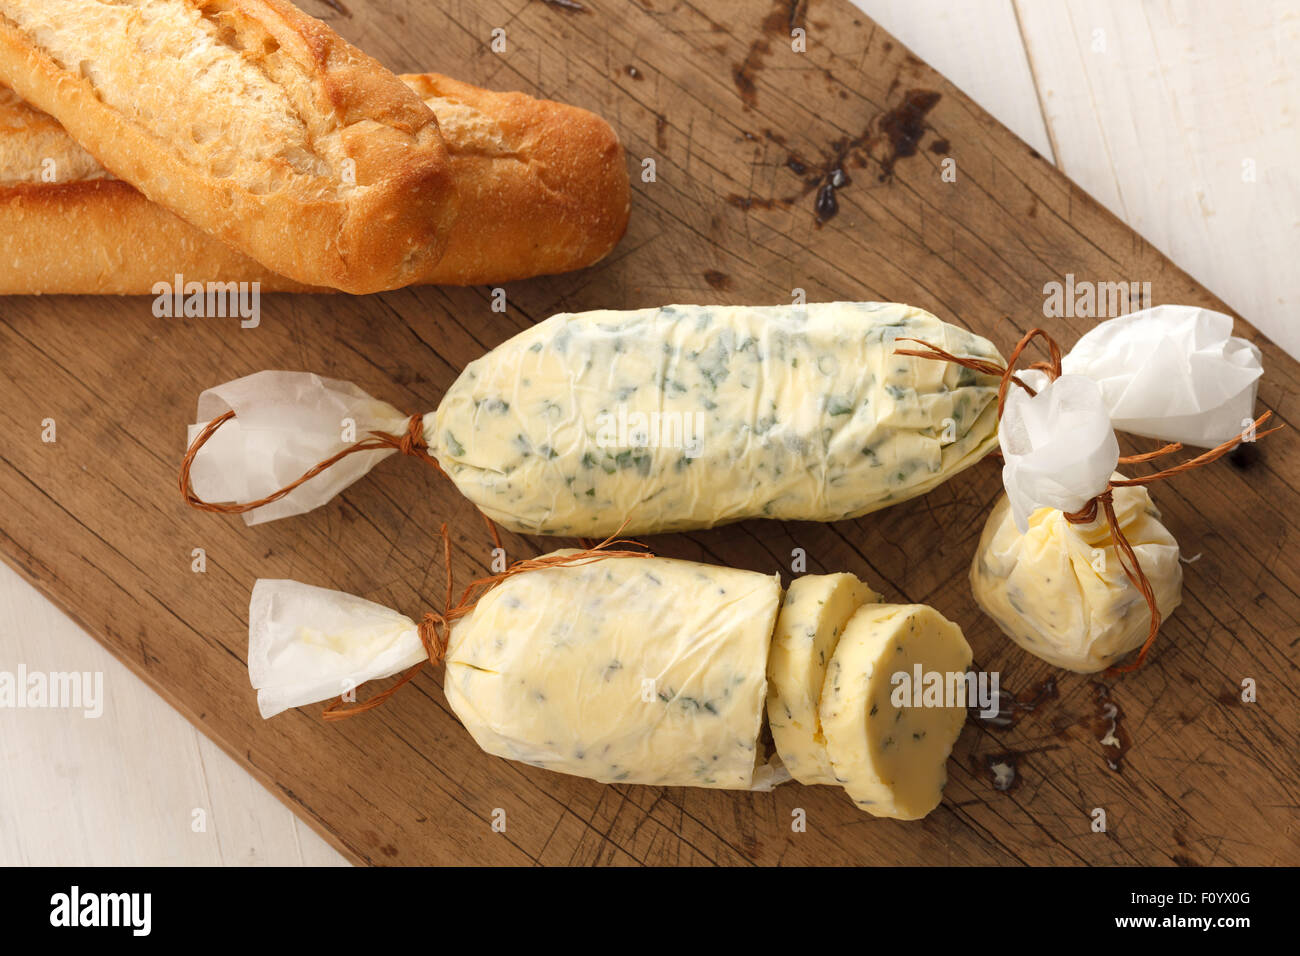 Knoblauch Brot zusammengesetzte Butter Kräuter Baguette Thymian Rosmarin Koriander Oregano frisch gehackte Stockbild